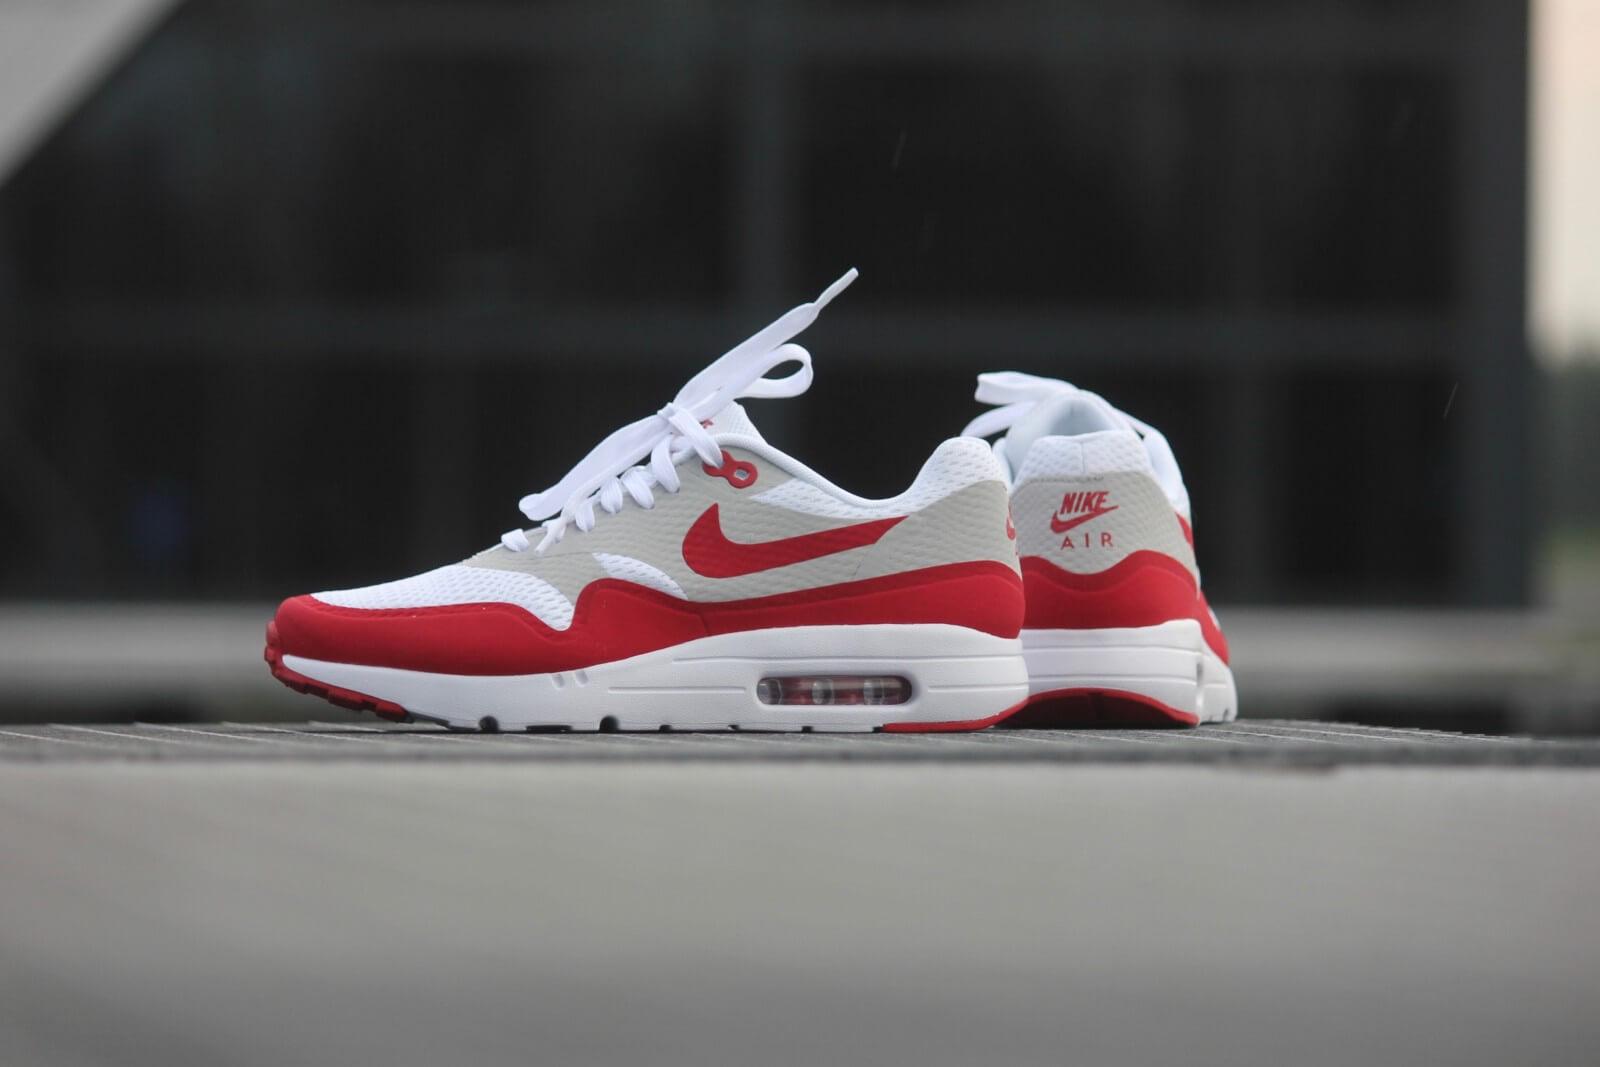 Nike Air Max 1 Black White Varsity Red | SneakerFiles